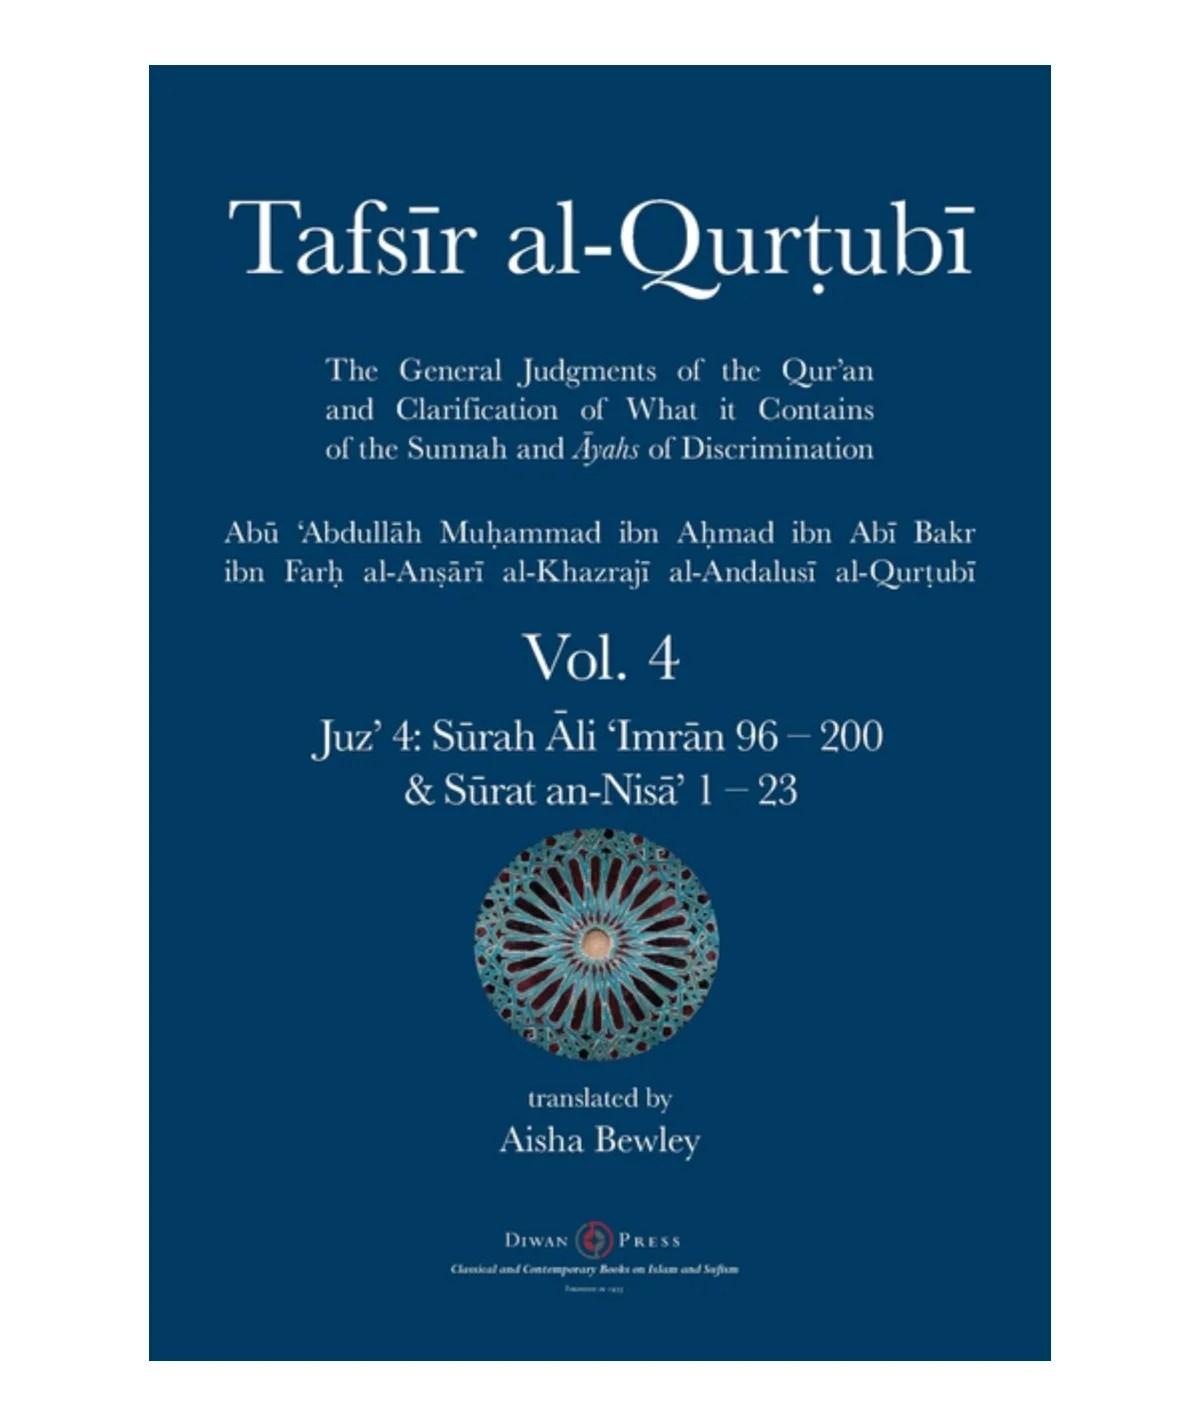 Tafsir al-Qurtubi Vol. 4: Juz' 4: Sūrah Āli 'Imrān 96 - Sūrat an-Nisā' 1 - 23  ( Tafsir Al-Qurtubi  ): Al-Qurtubi, Abu 'abdullah Muhammad   Bewley, Aisha Abdurrahman   Bewley, Abdalhaqq